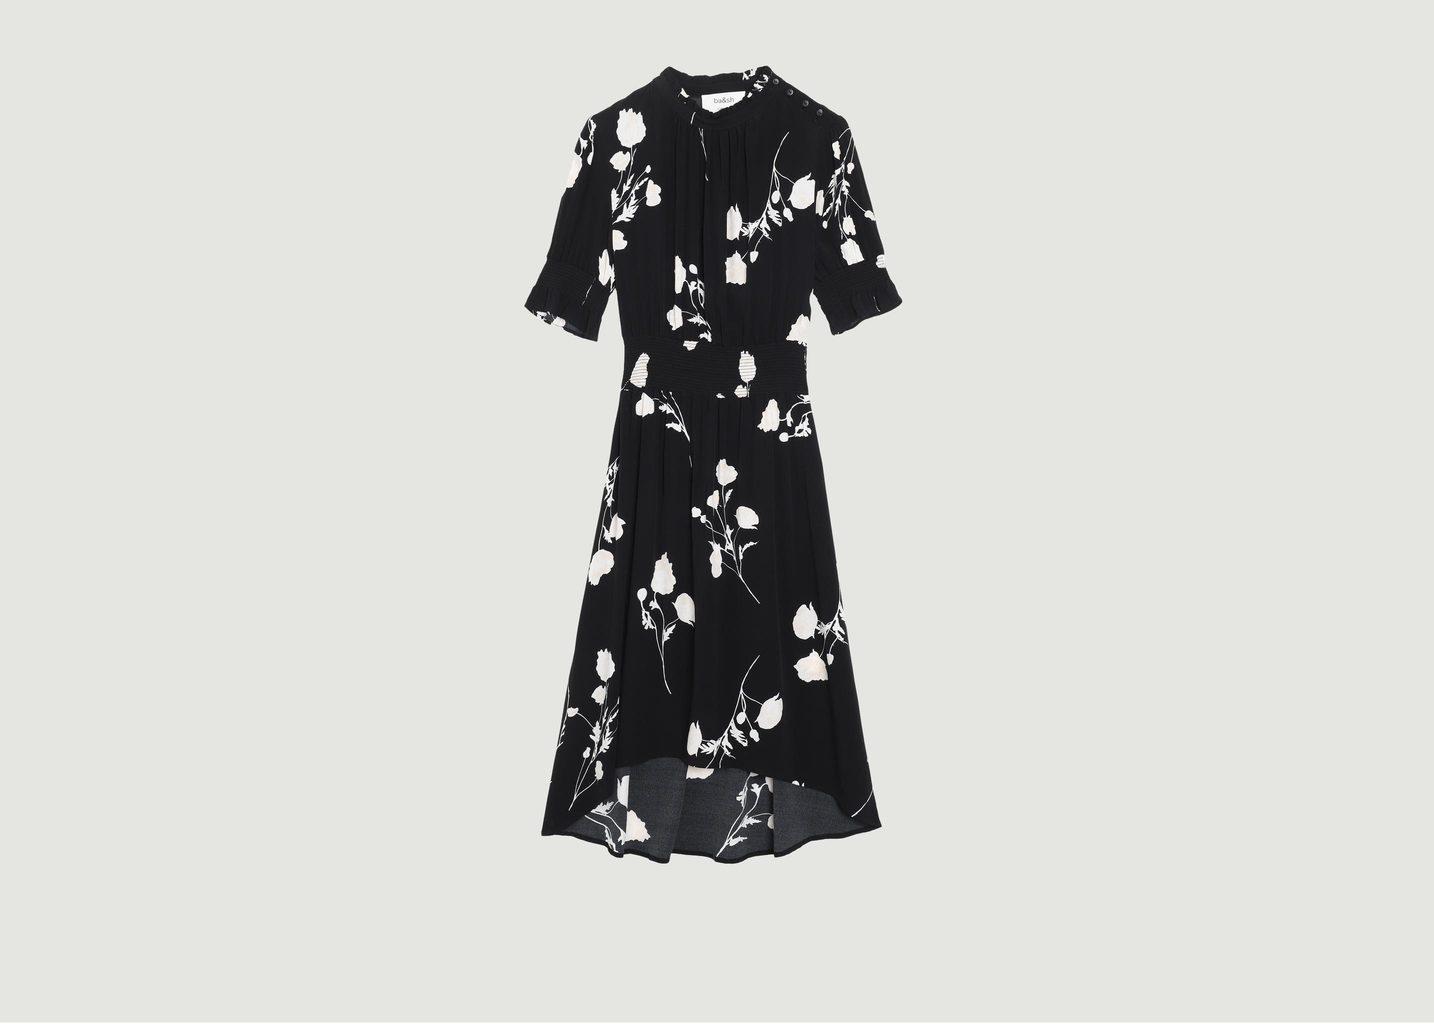 Robe Imprimé Fleuri Poppy - Ba&sh